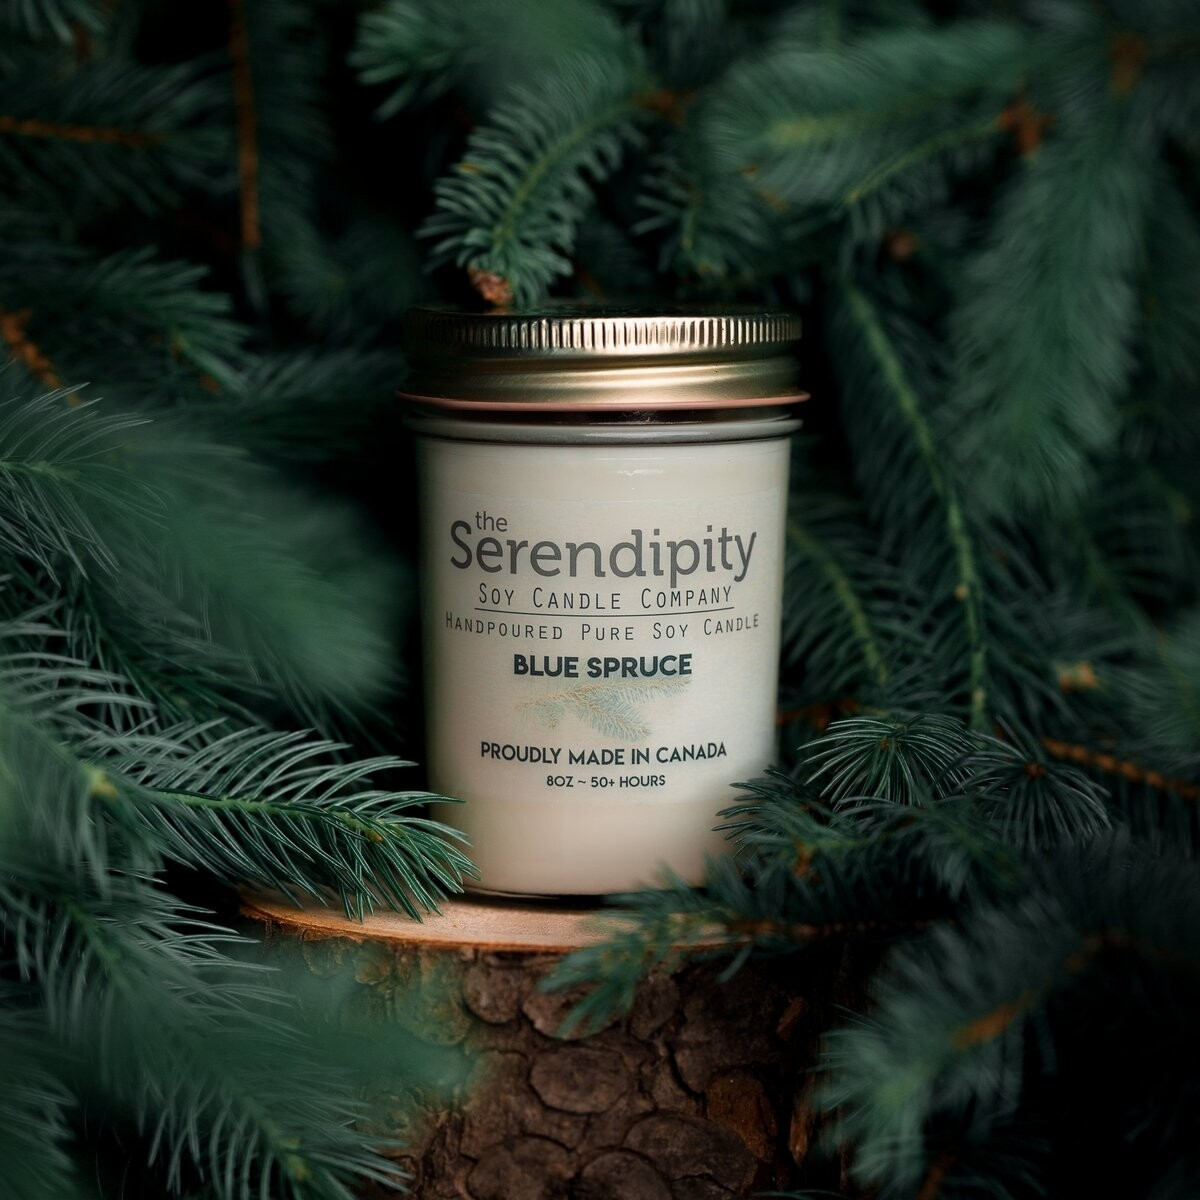 Serendipity 8 oz Soy Candle Jar   Blue Spruce